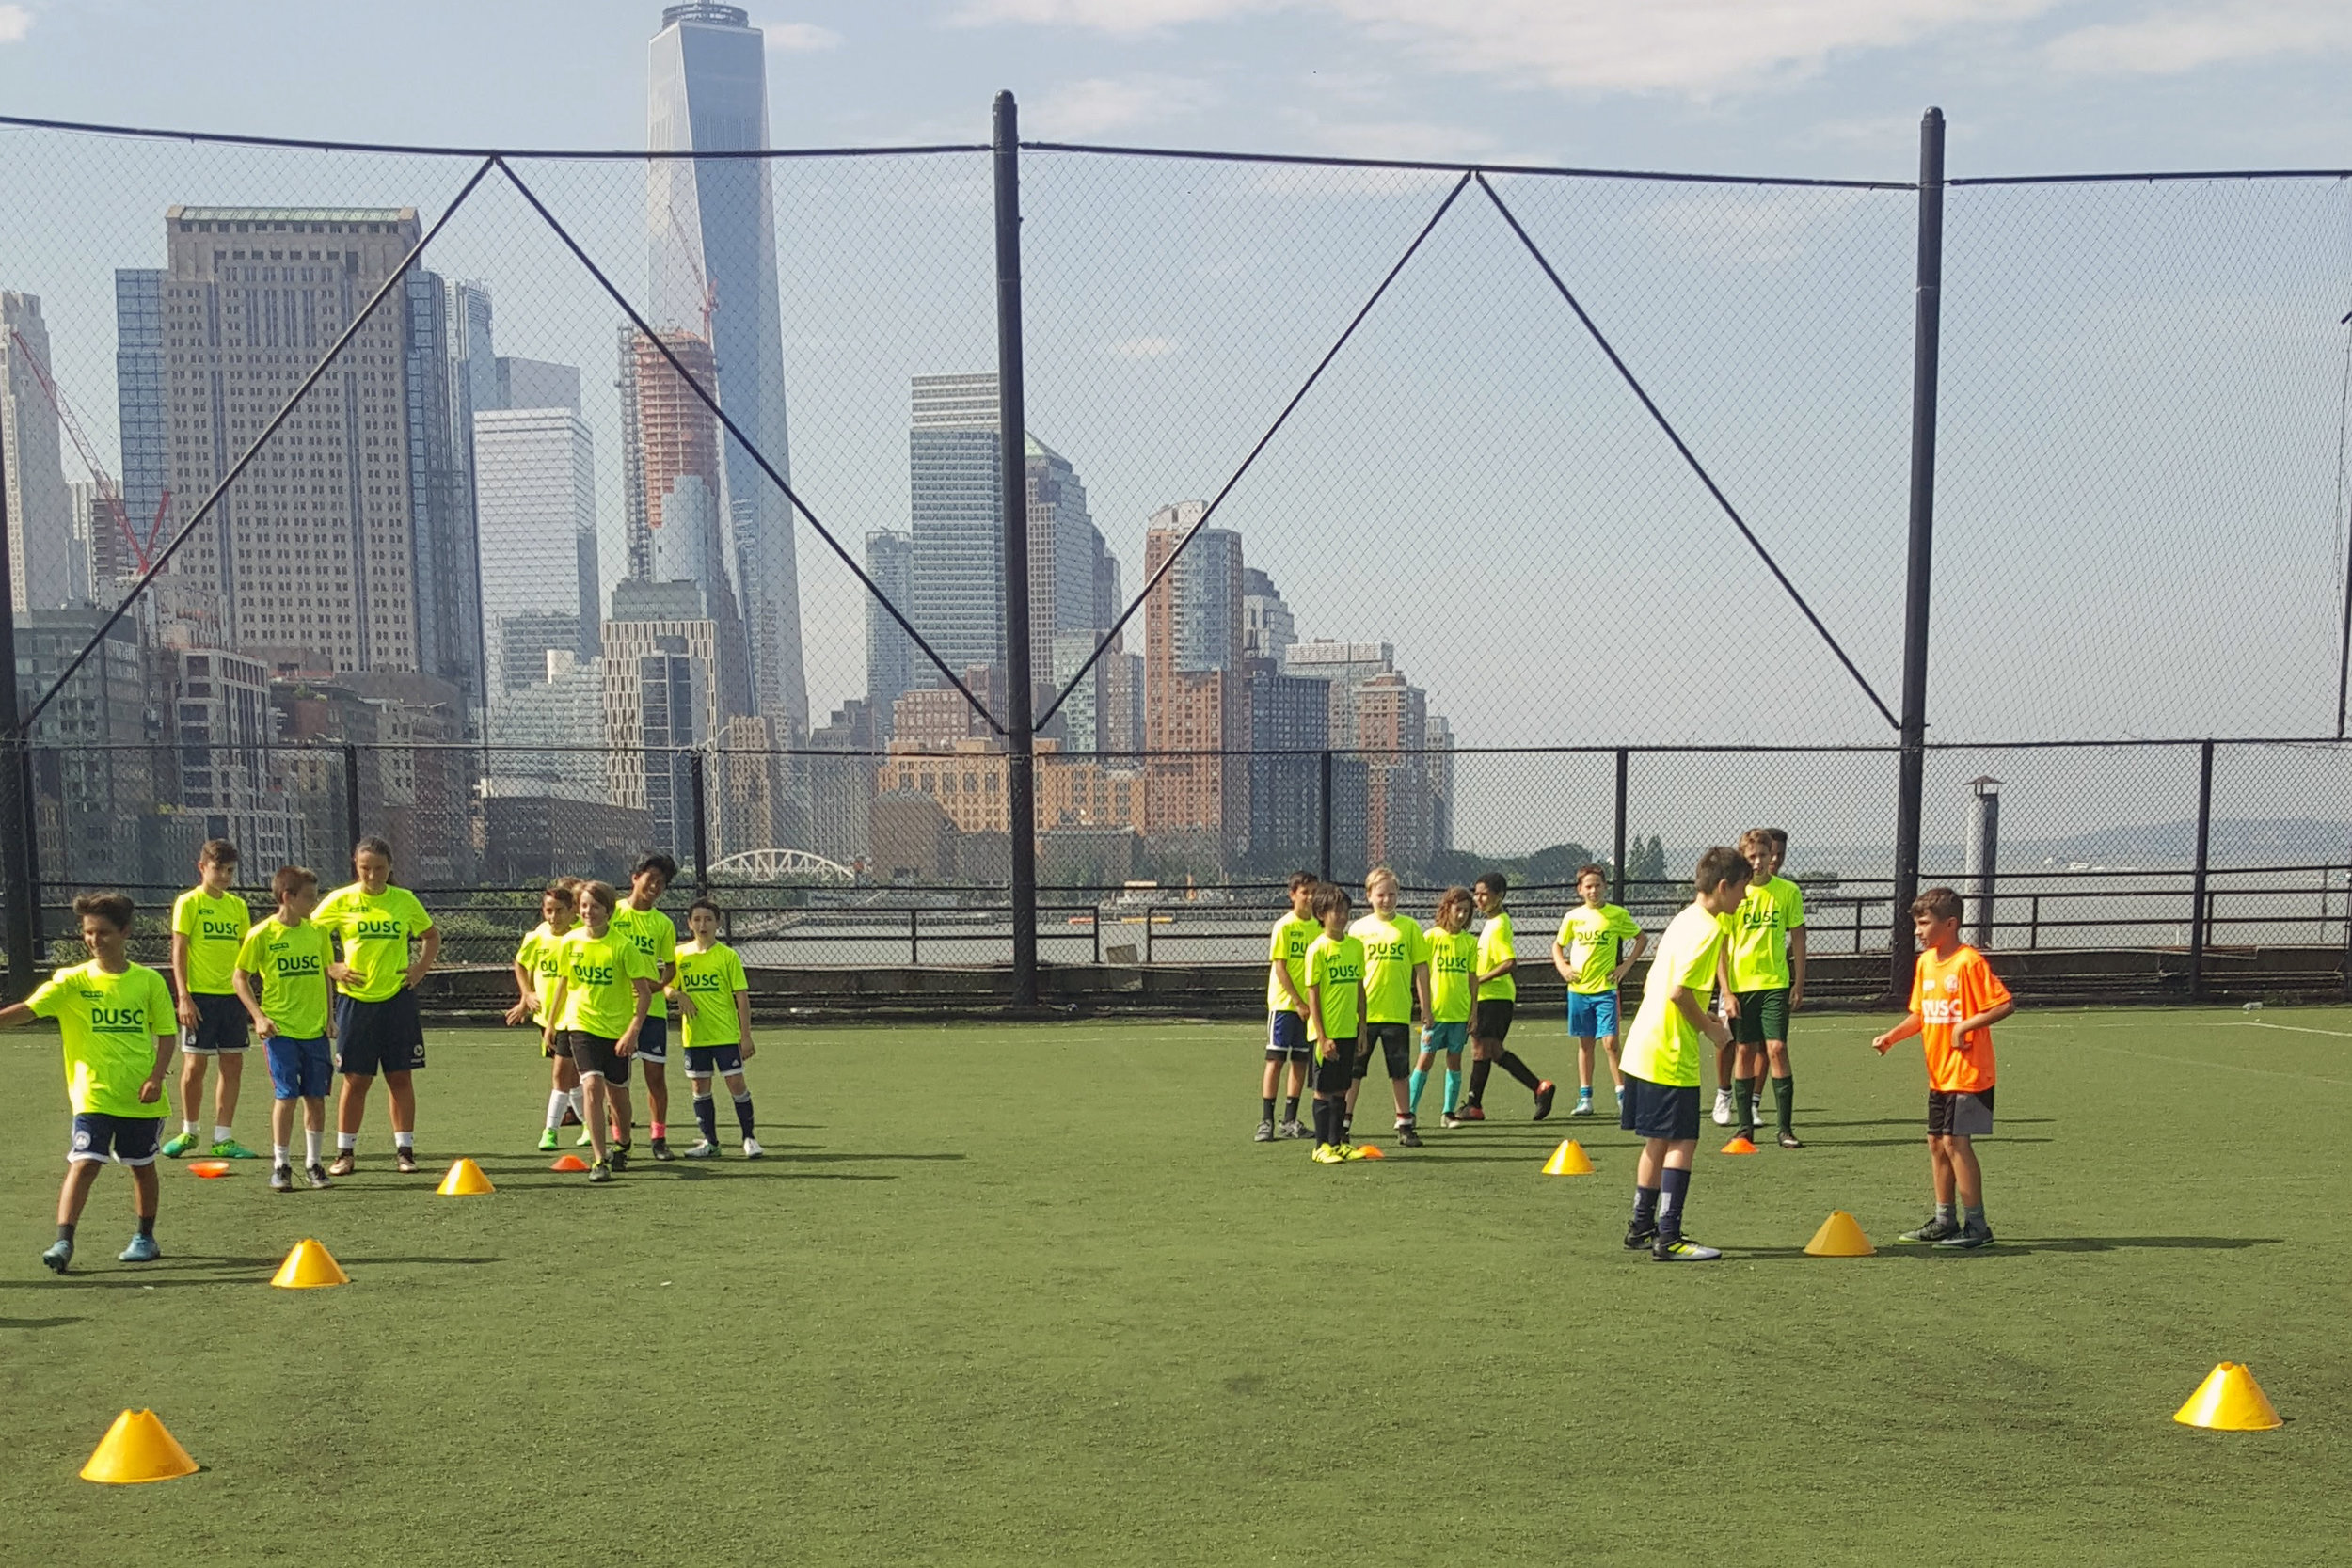 DUSC-downtown-united-soccer-club-youth-new-york-city_advanced-camp-002.jpg